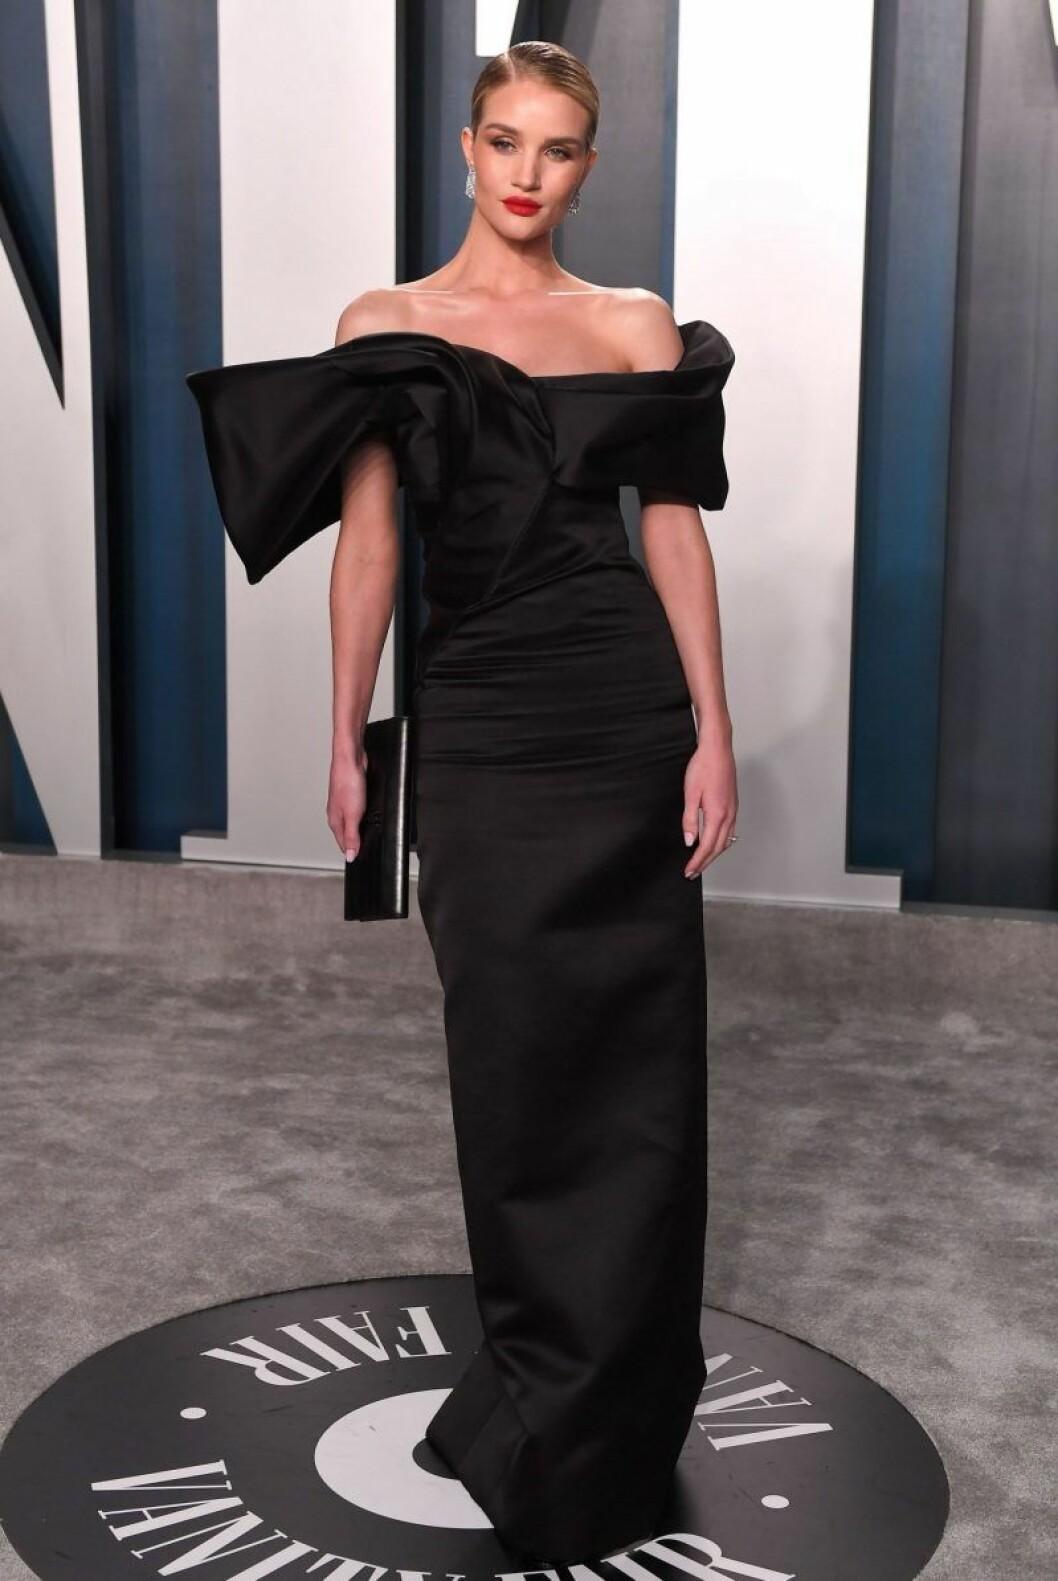 Rosie Huntington Whiteley i svart klänning